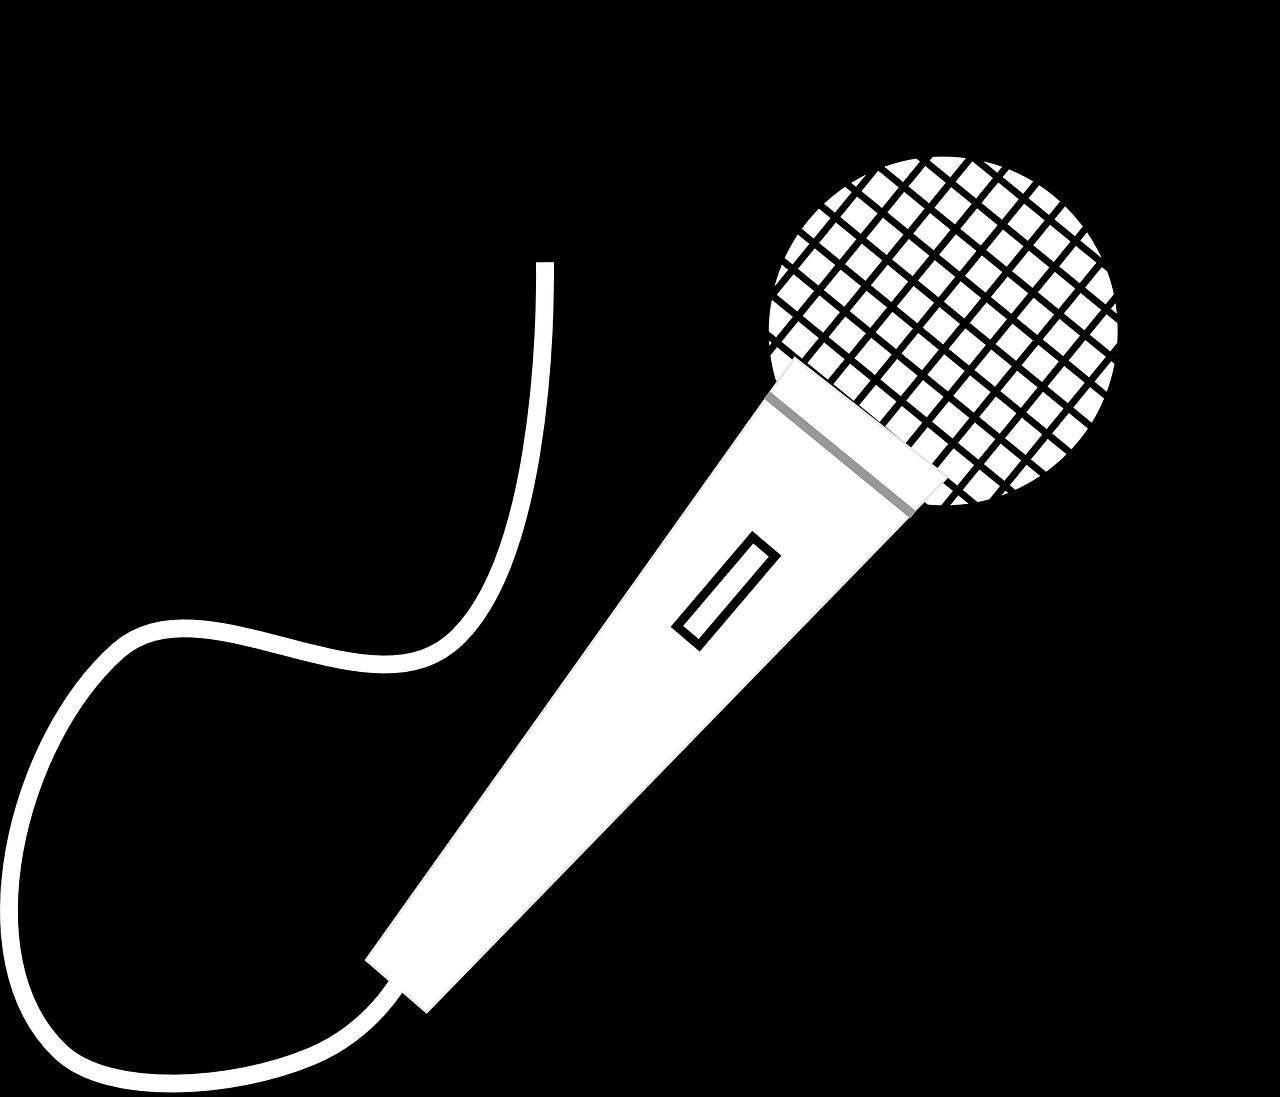 метро картинка контур микрофона знать